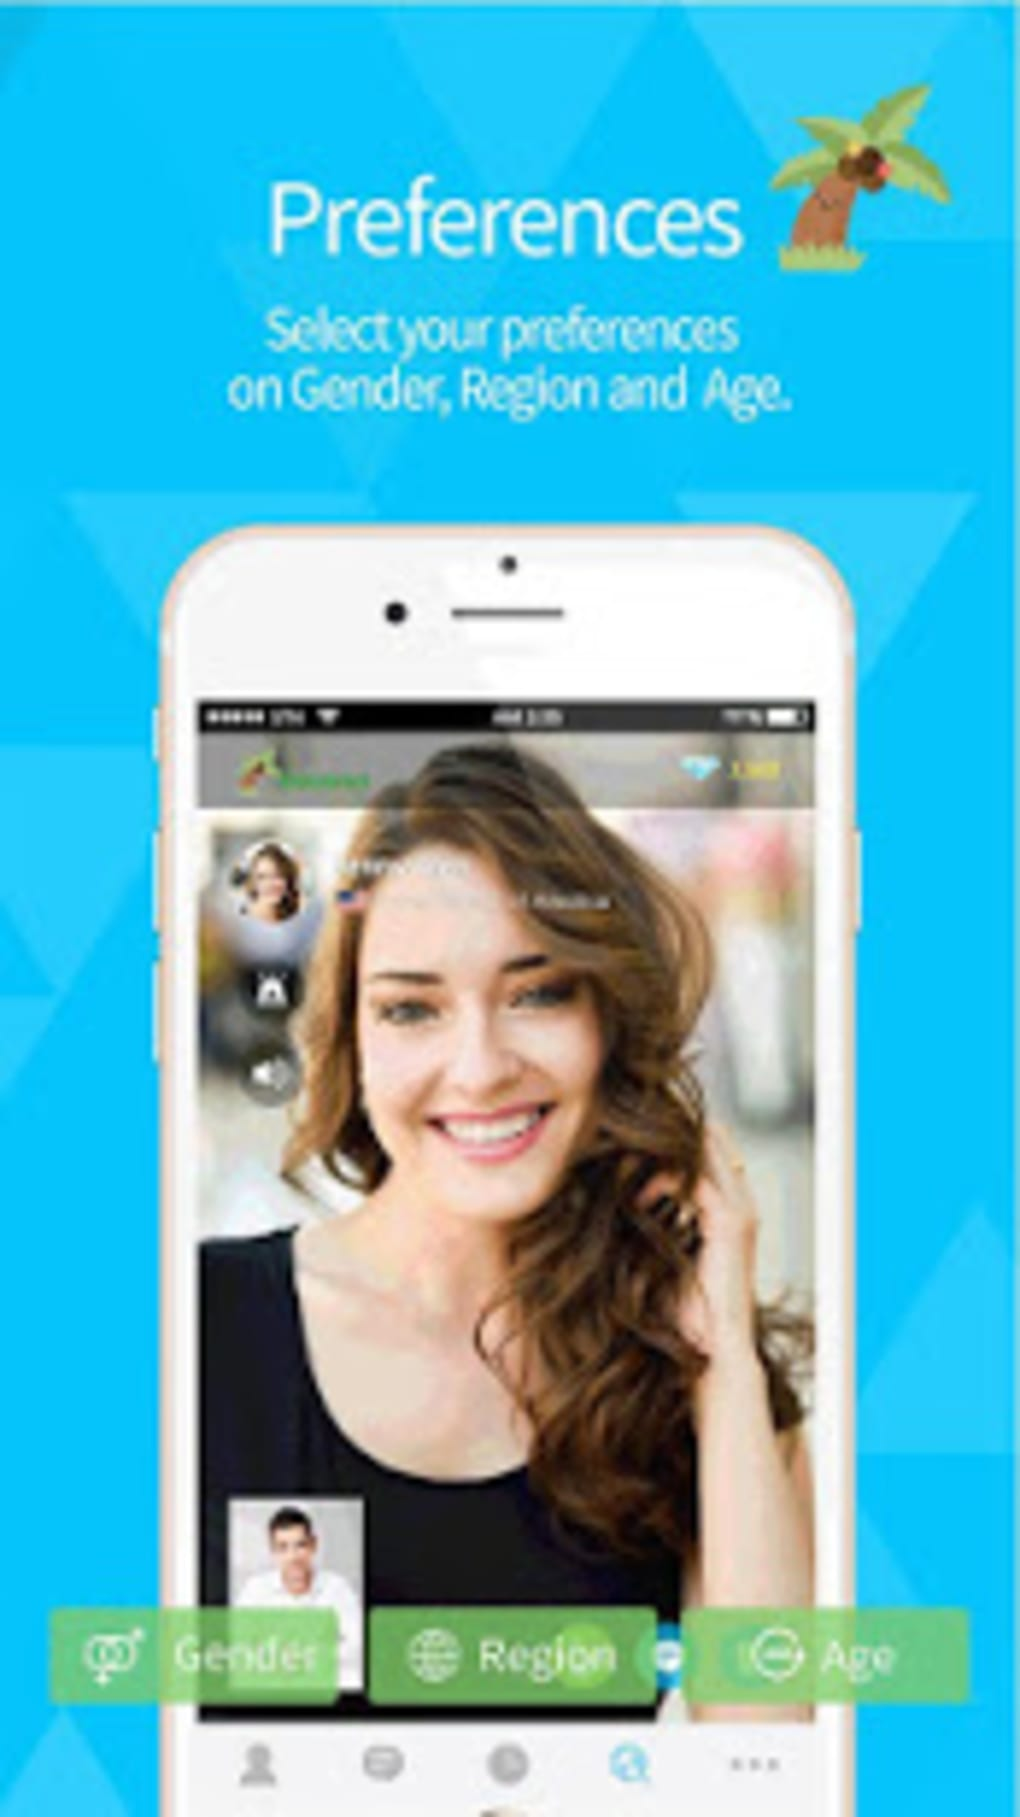 Online facetime chat